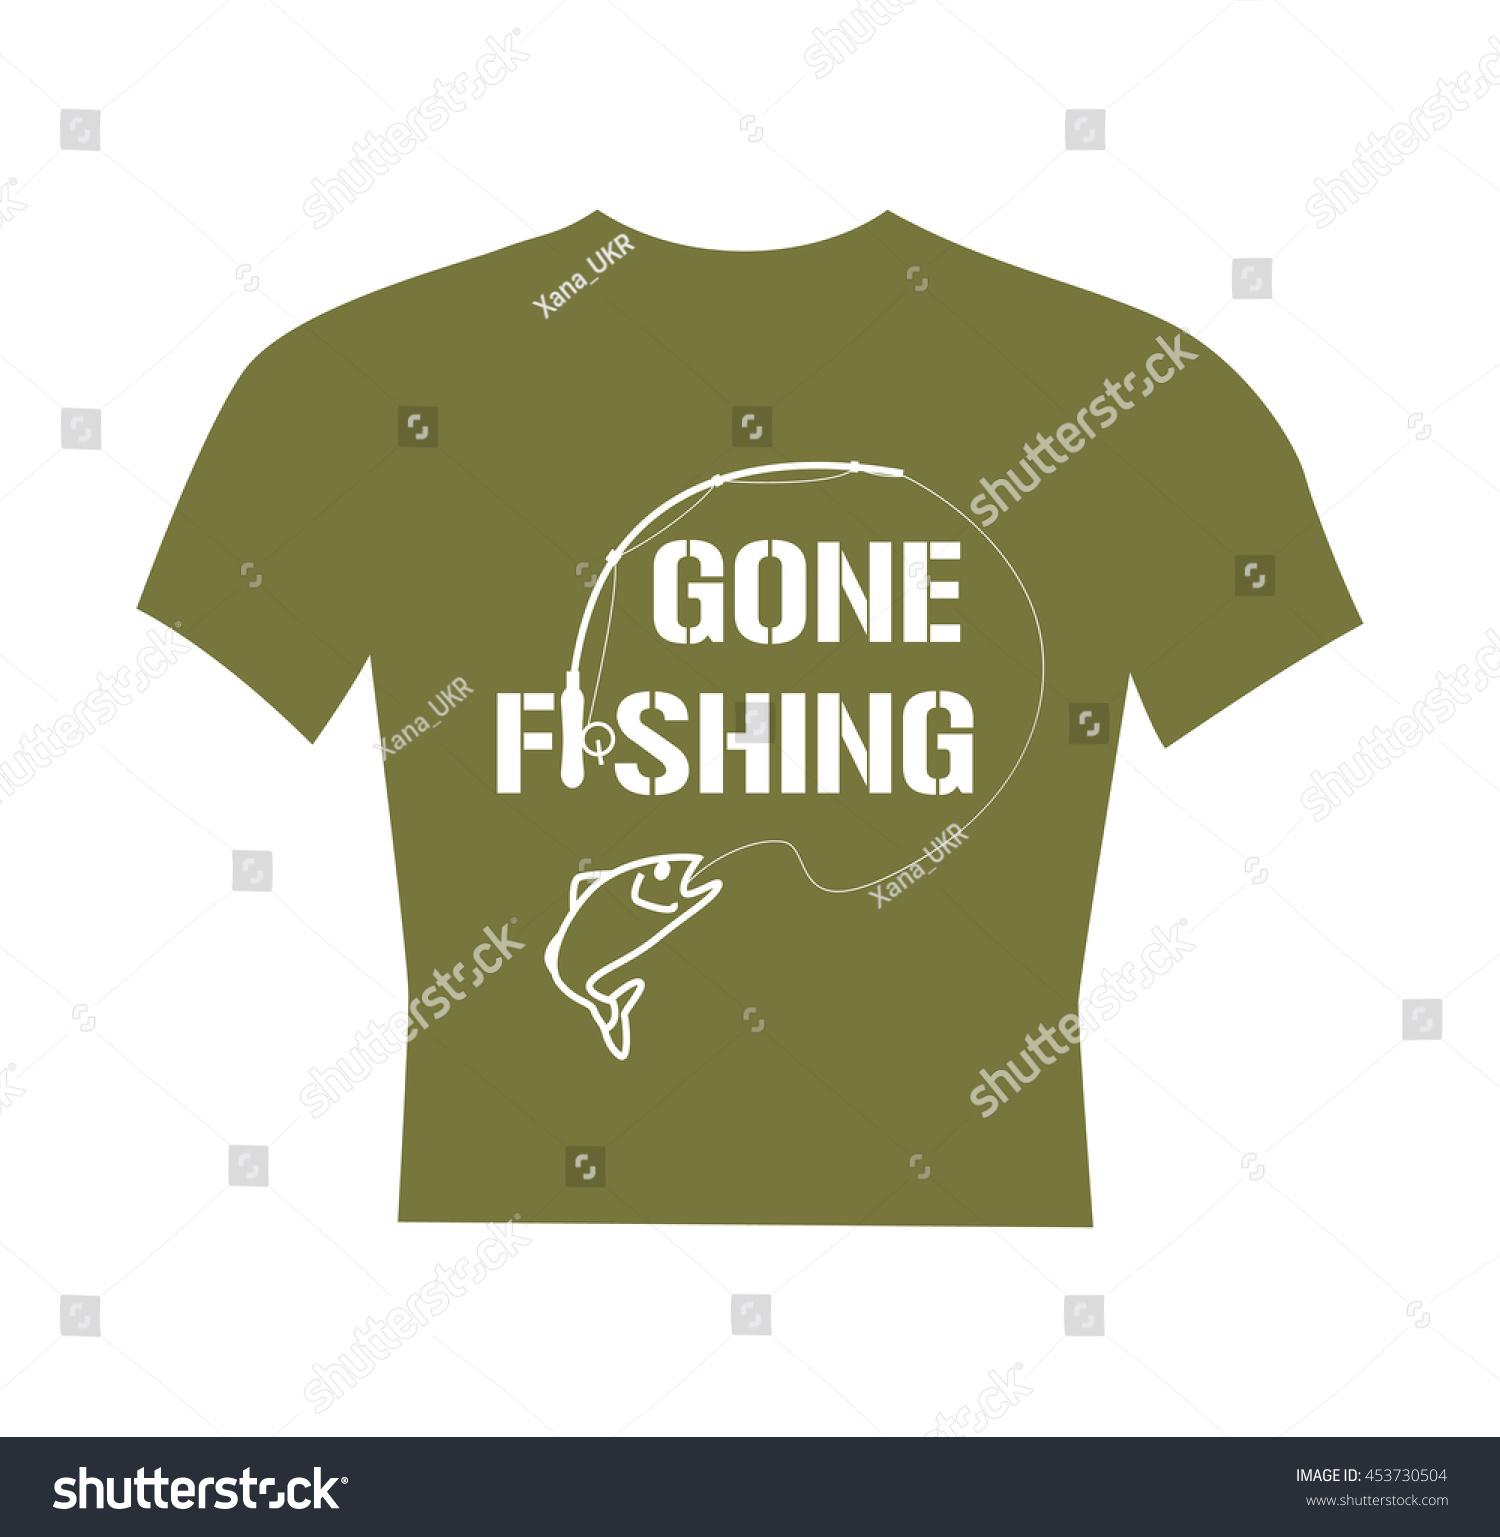 Tshirt gone fishing text fisherman clothes stock vector 453730504 fisherman clothes design flat vector illustration buycottarizona